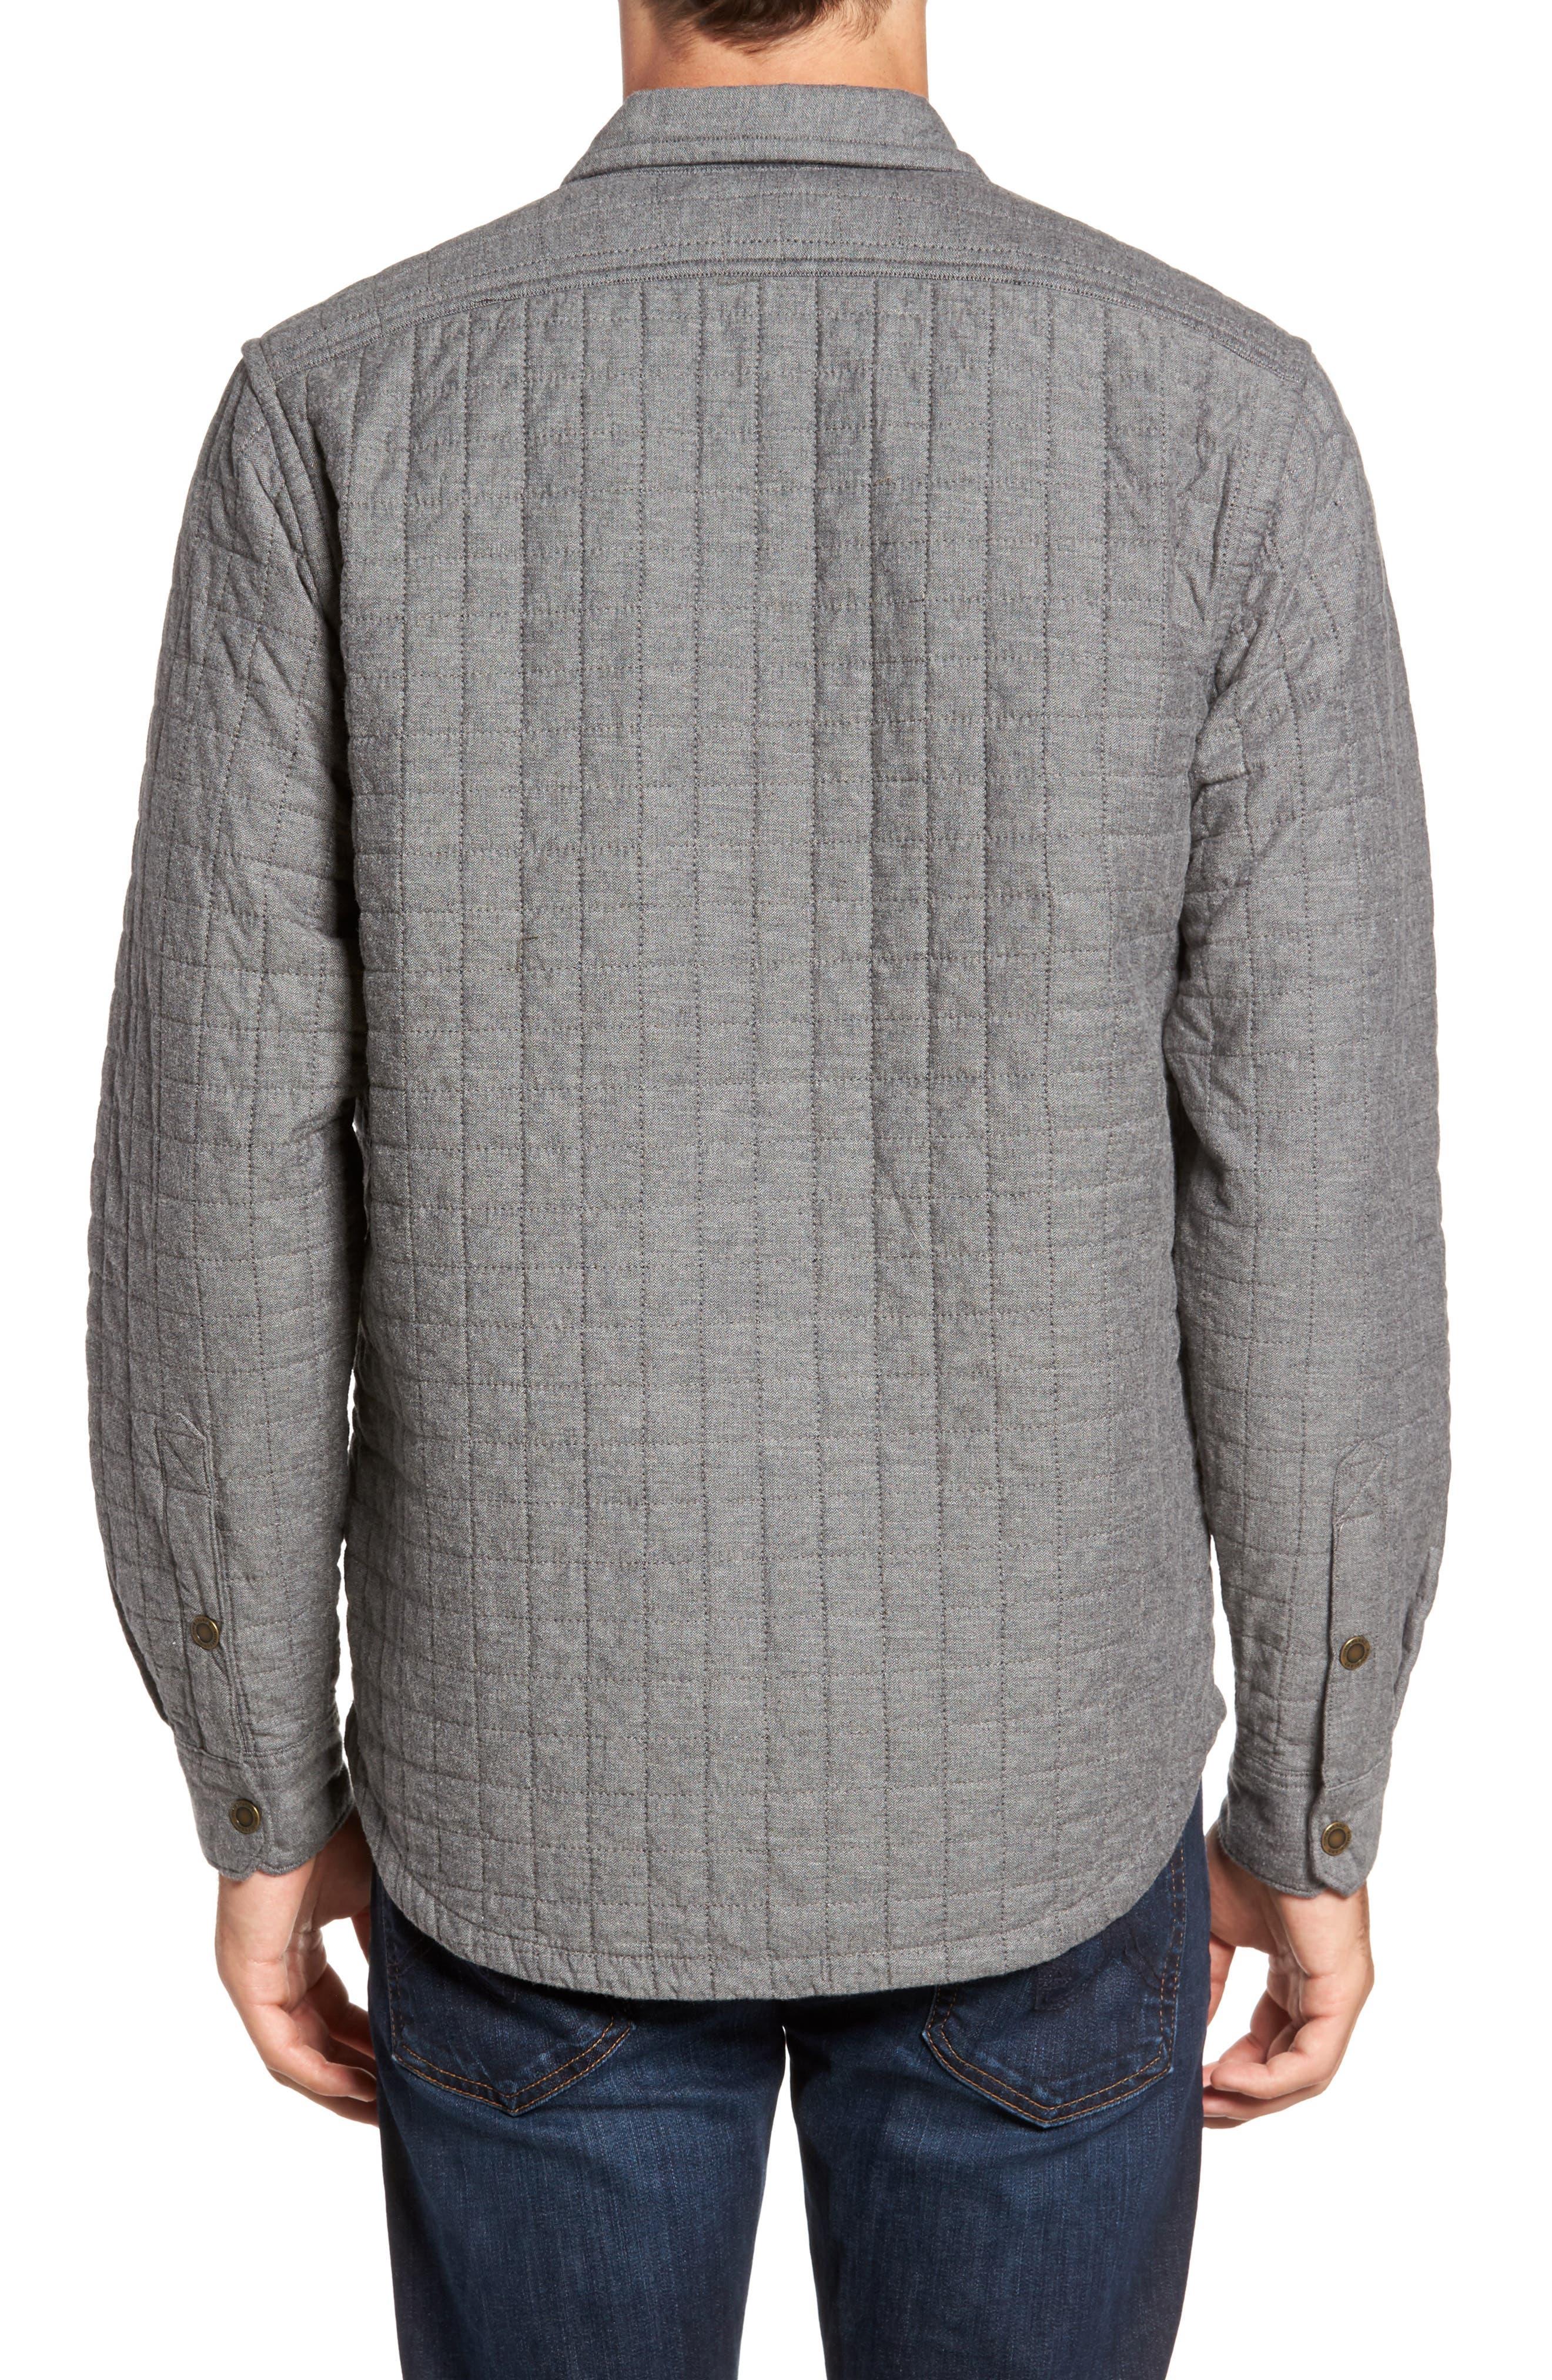 Gunstock River Lightweight Quilted Shirt Jacket,                             Alternate thumbnail 2, color,                             Grey